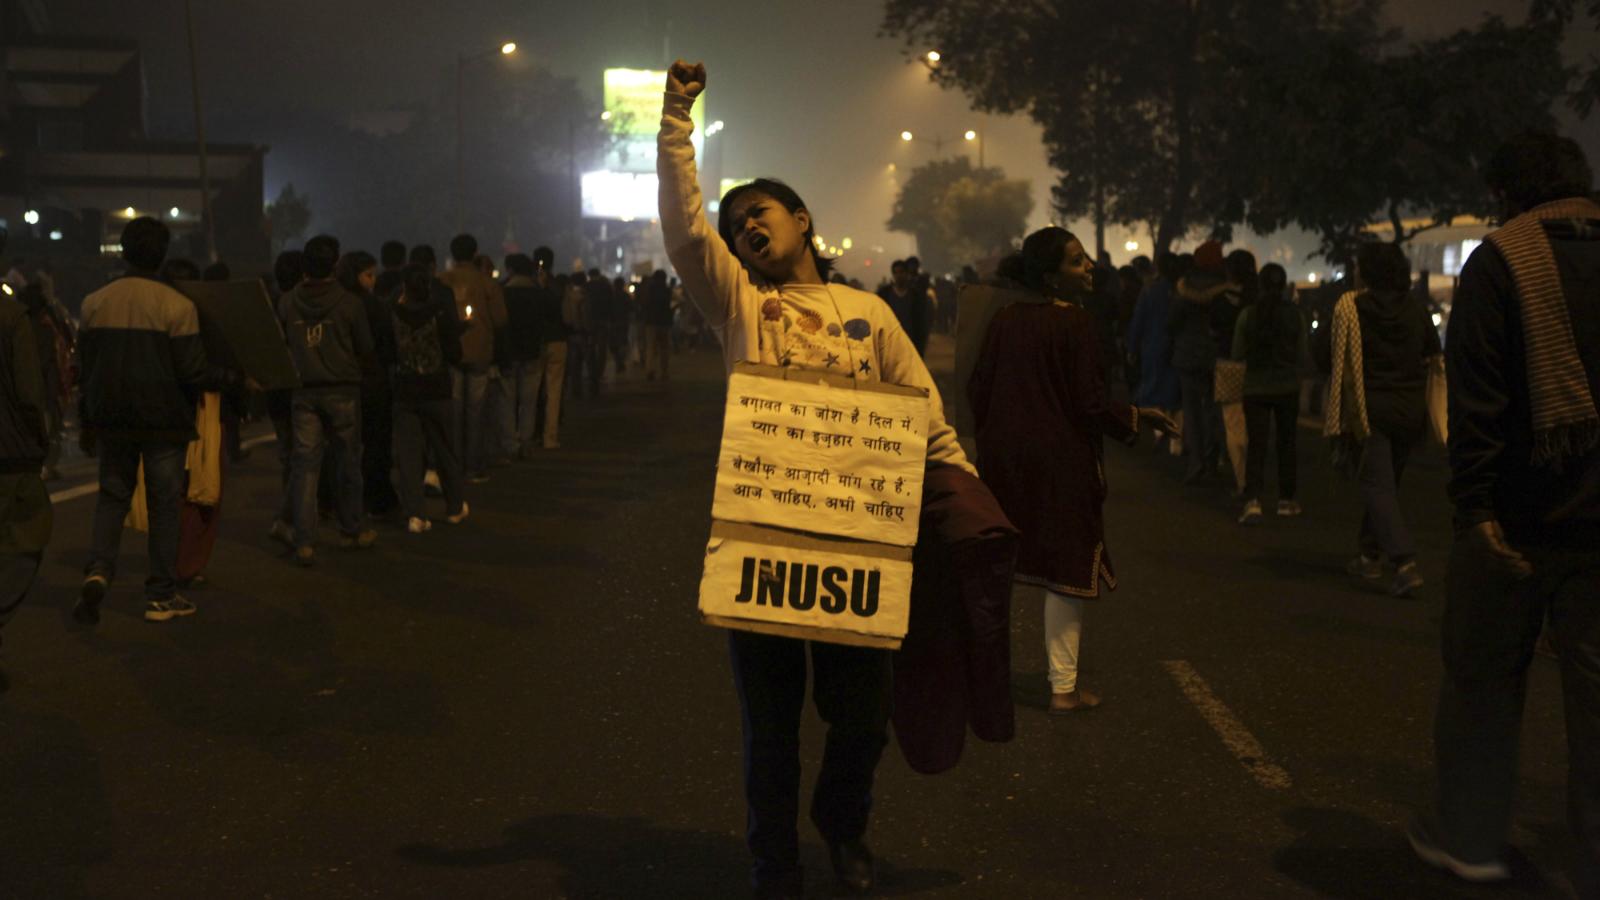 JNU-Afzal Guru-JNU Students union-ABVP-Student protests-Narendra Modi-Jawaharlal Nehru University-AISA-JNUSU